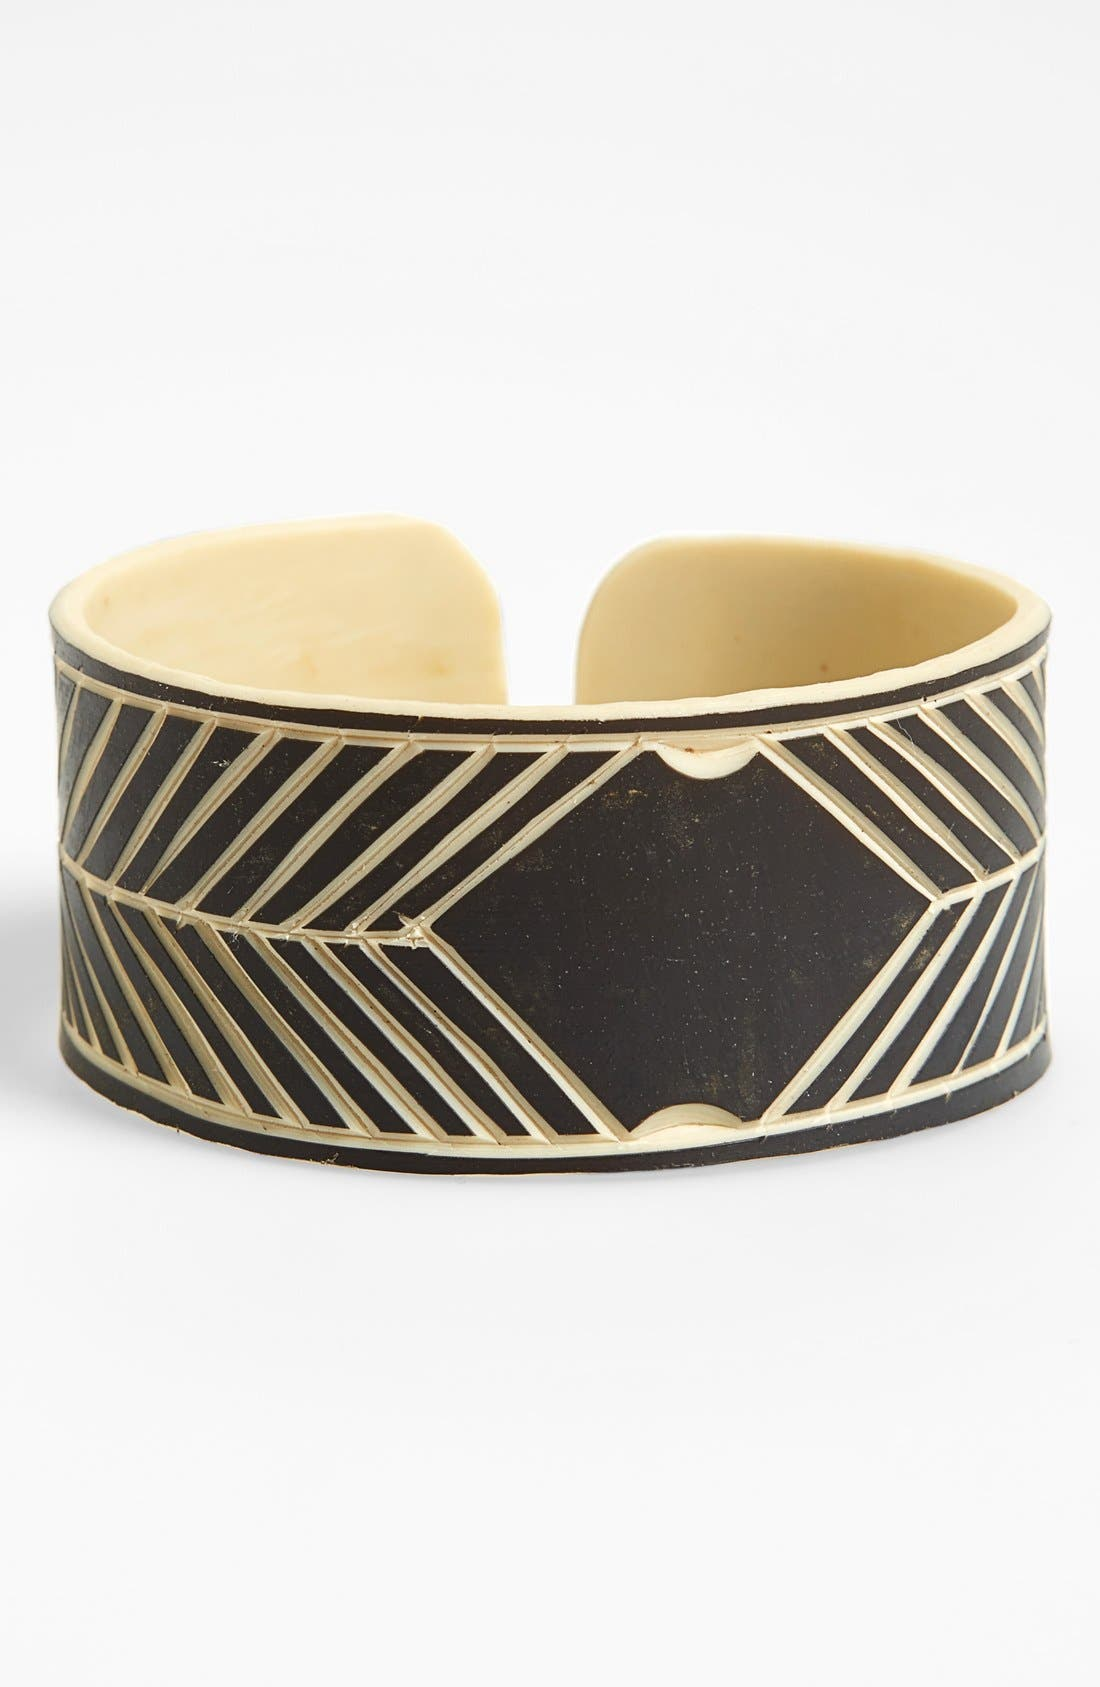 Alternate Image 1 Selected - The Base Project 'Skeleton Coast' Etched Cuff Bracelet